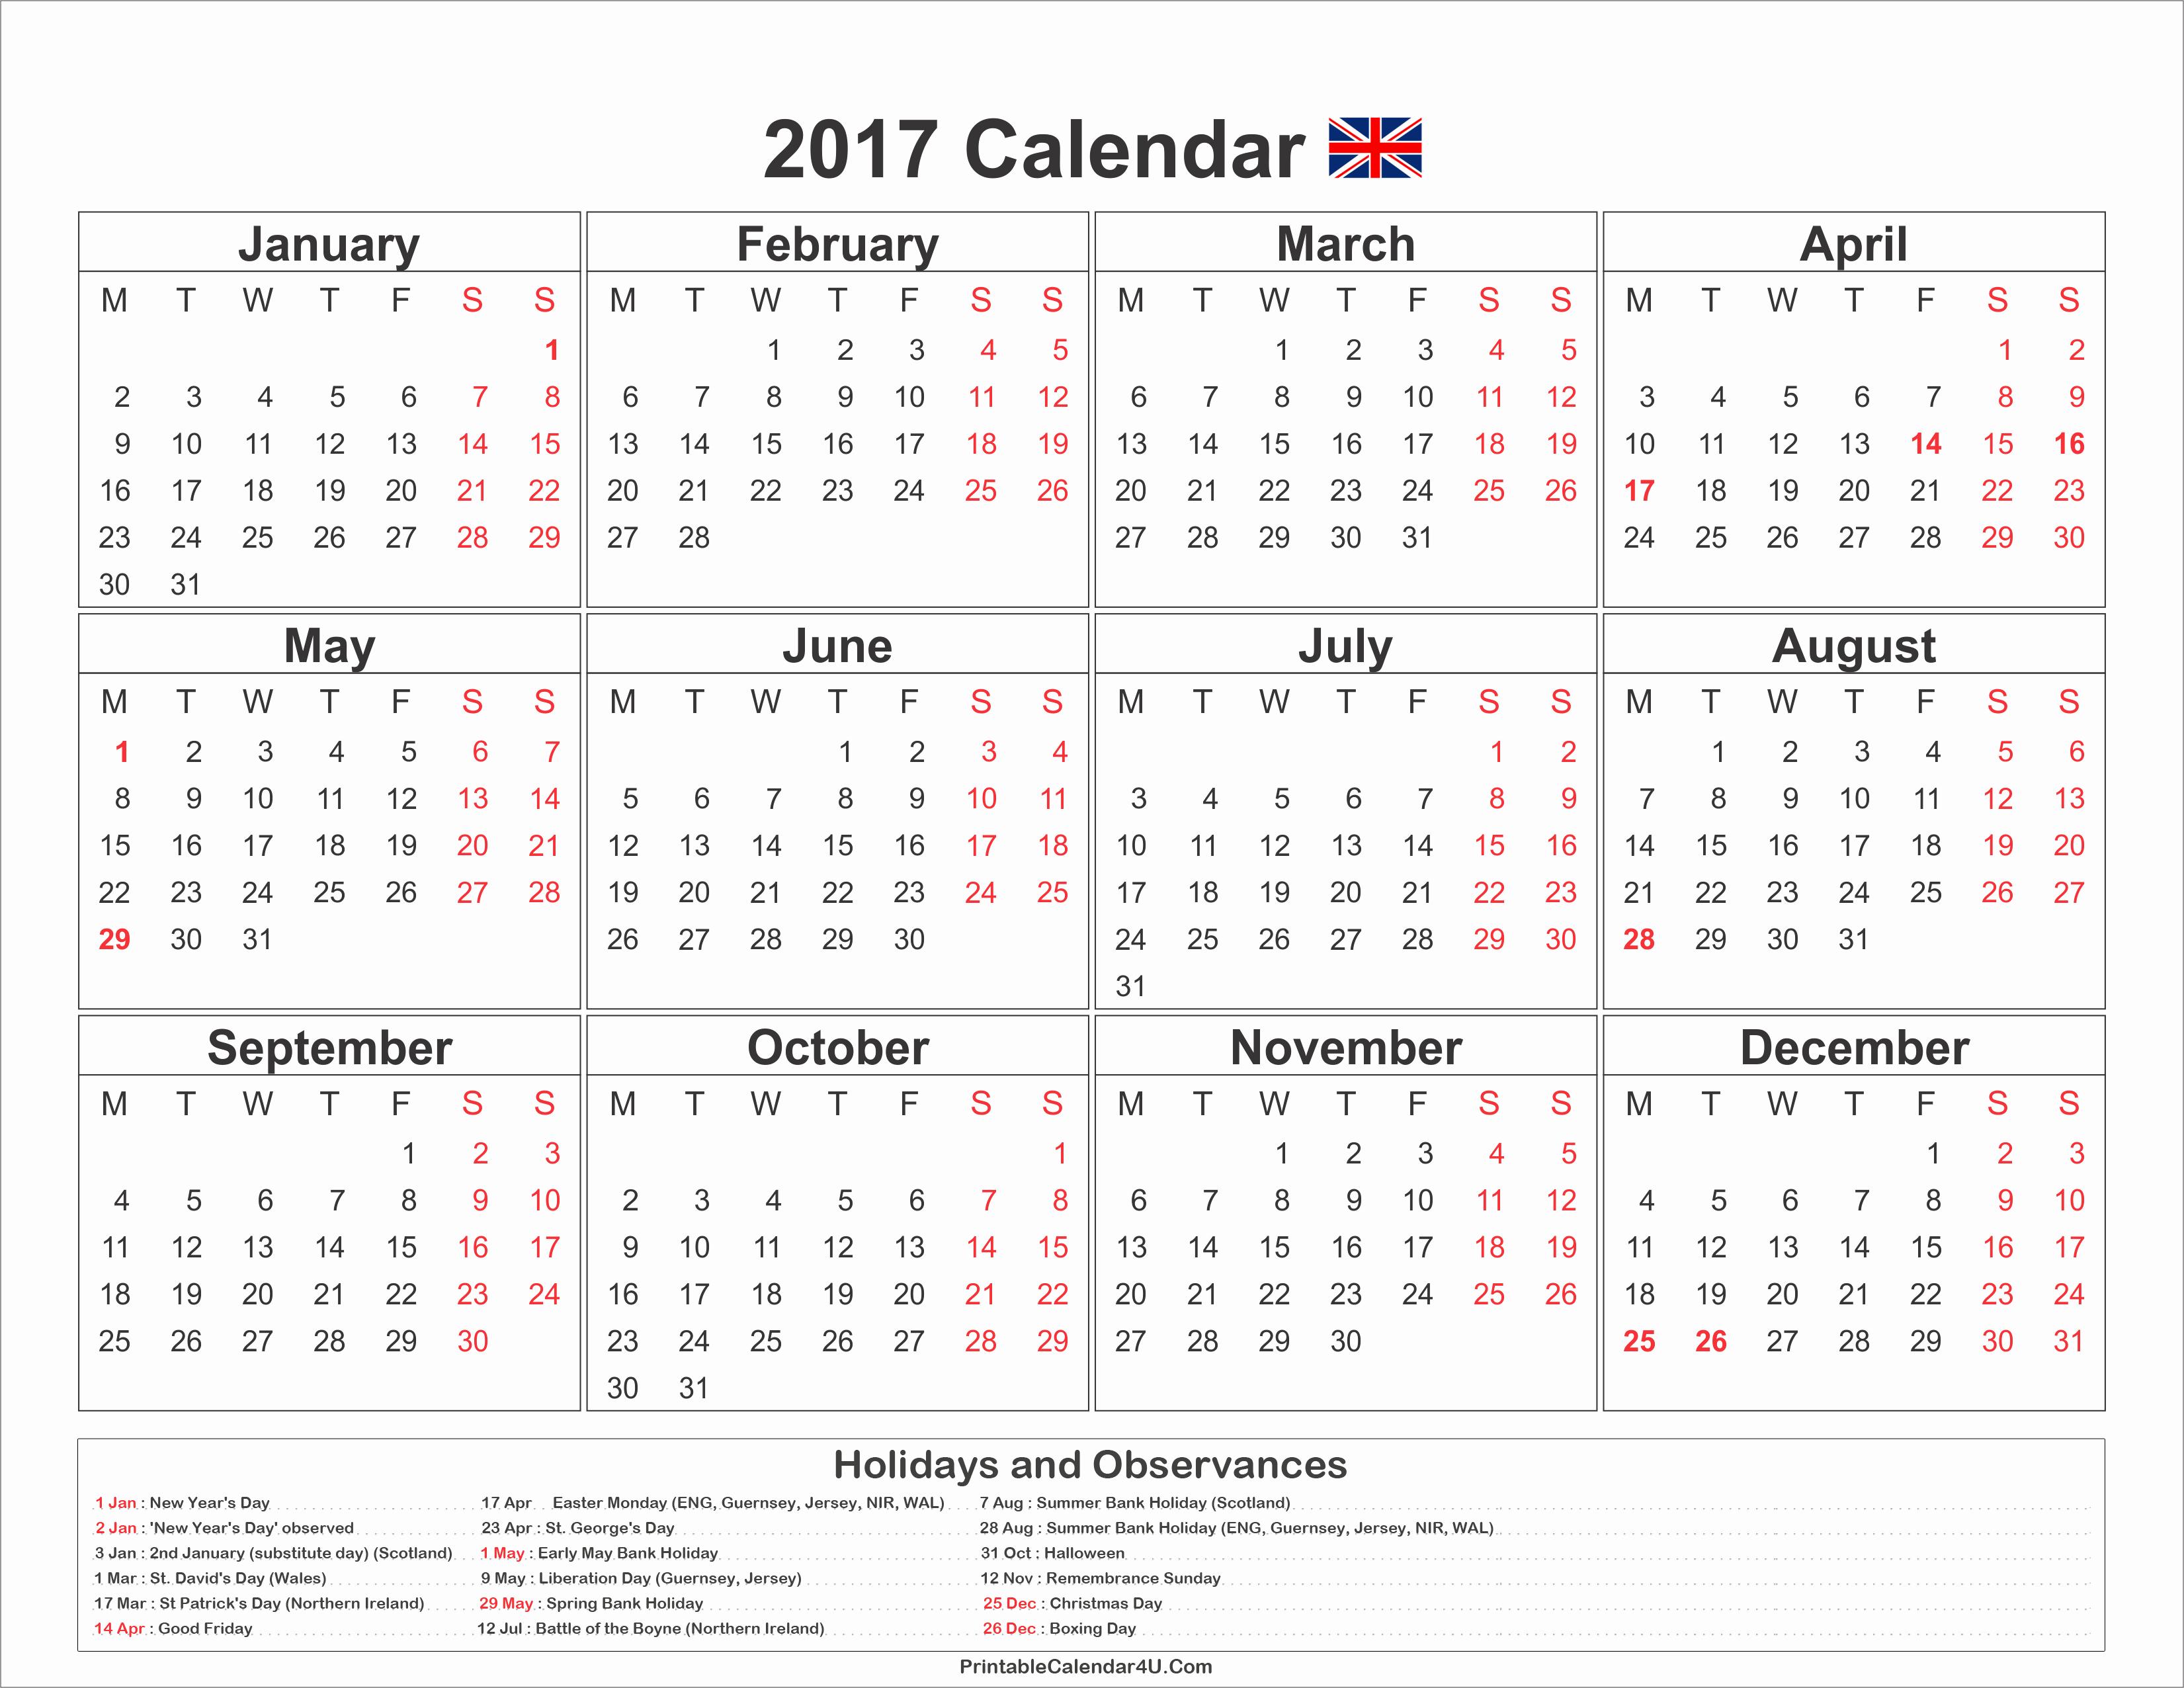 2017 Year Calendar Printable Free Awesome 2017 Calendar Uk with Holidays Free Printable Calendar 2017